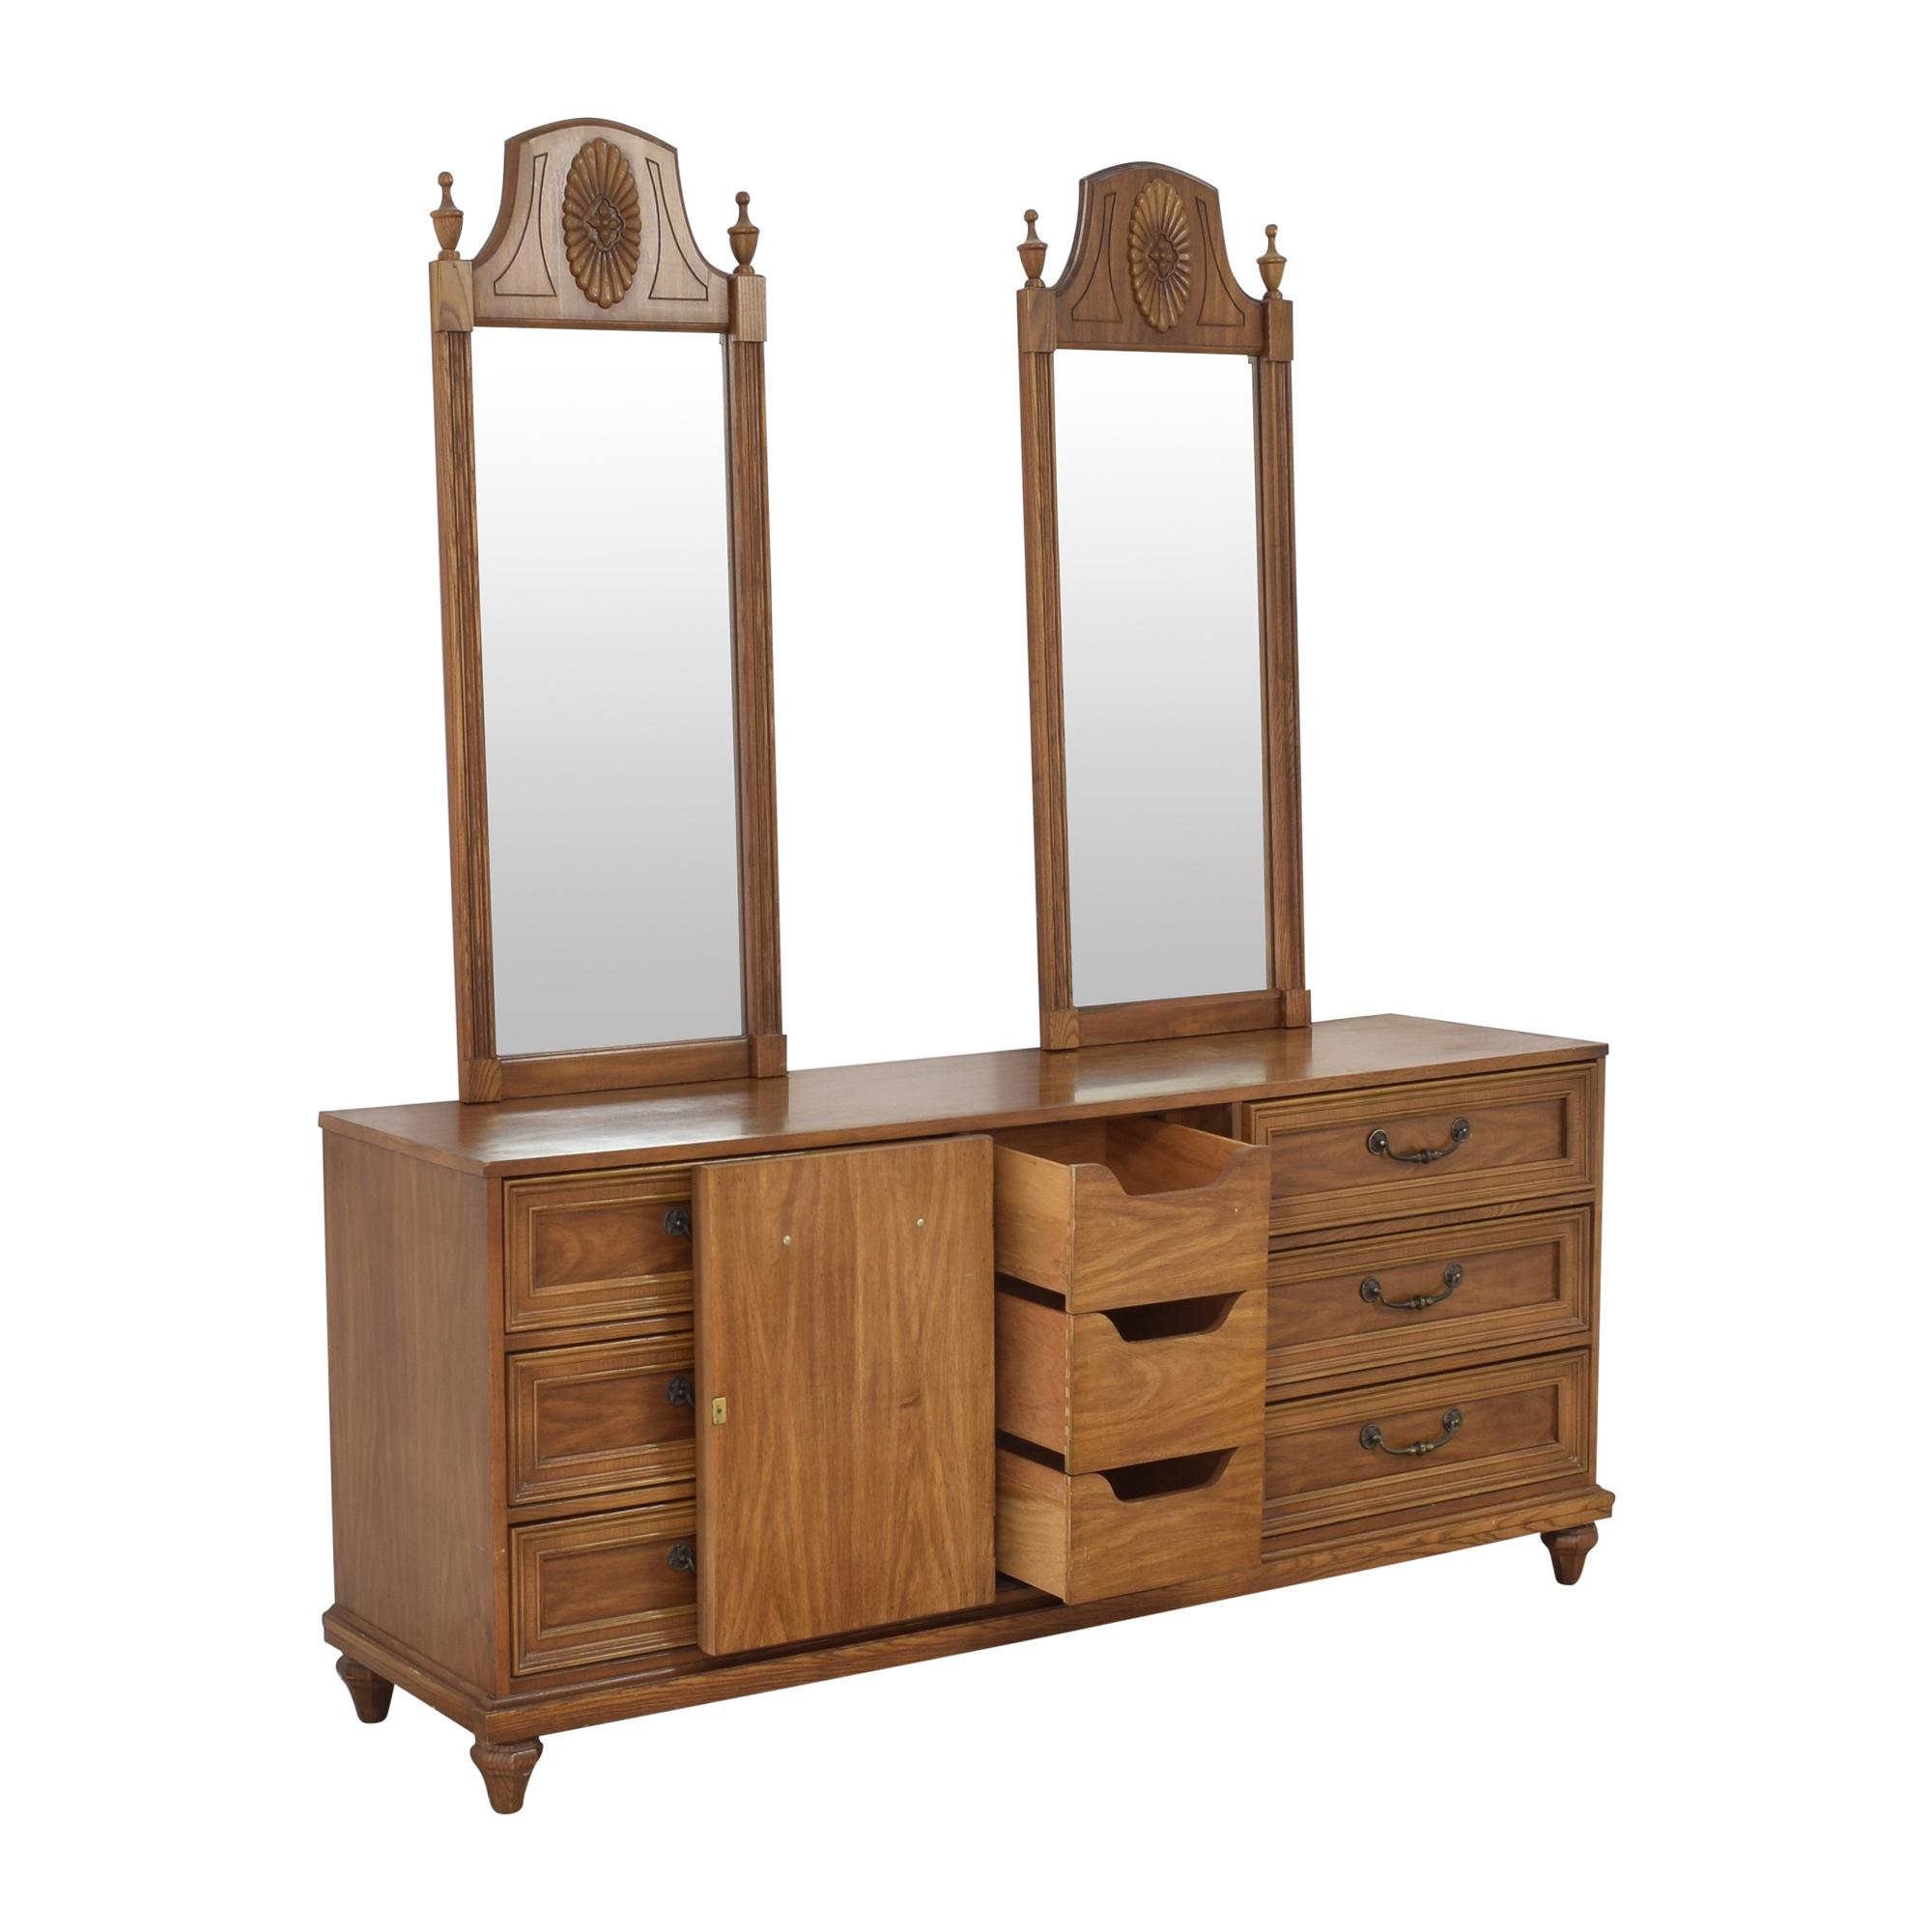 Bassett Furniture Bassett Furniture Cortese Triple Dresser with Mirrors second hand